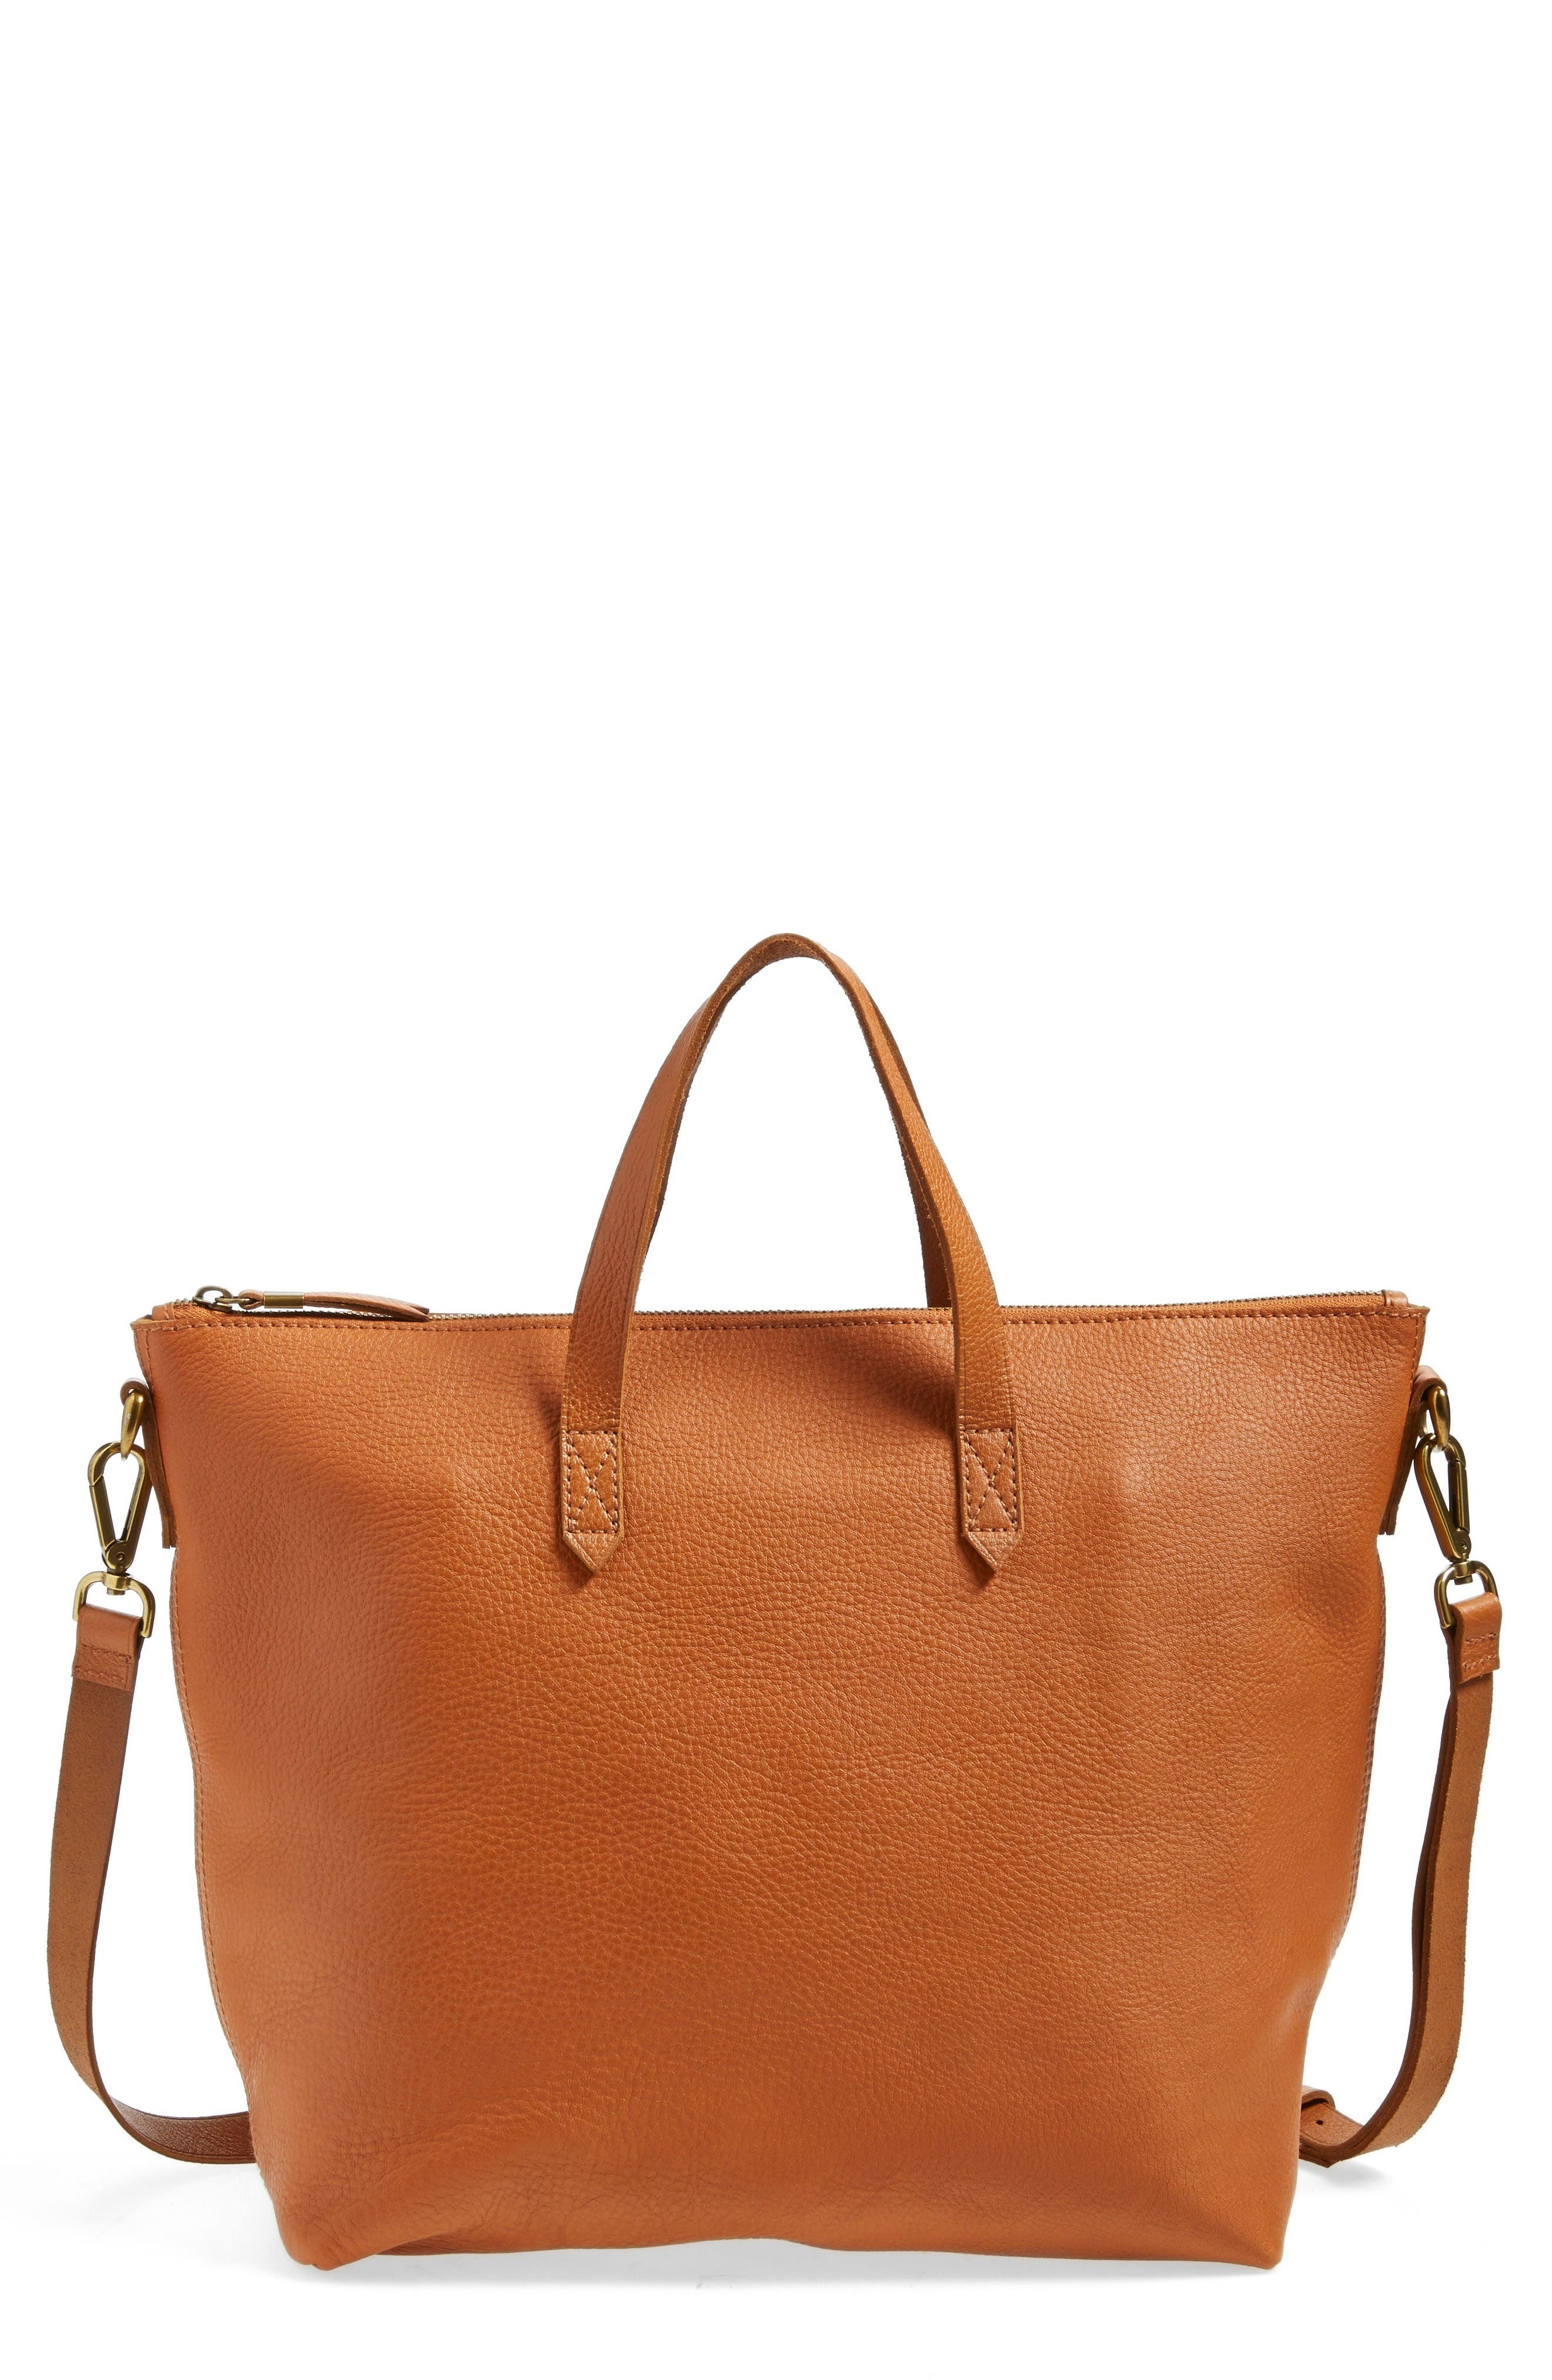 Alternate Image 1 Selected - Madewell Leather Transport Satchel